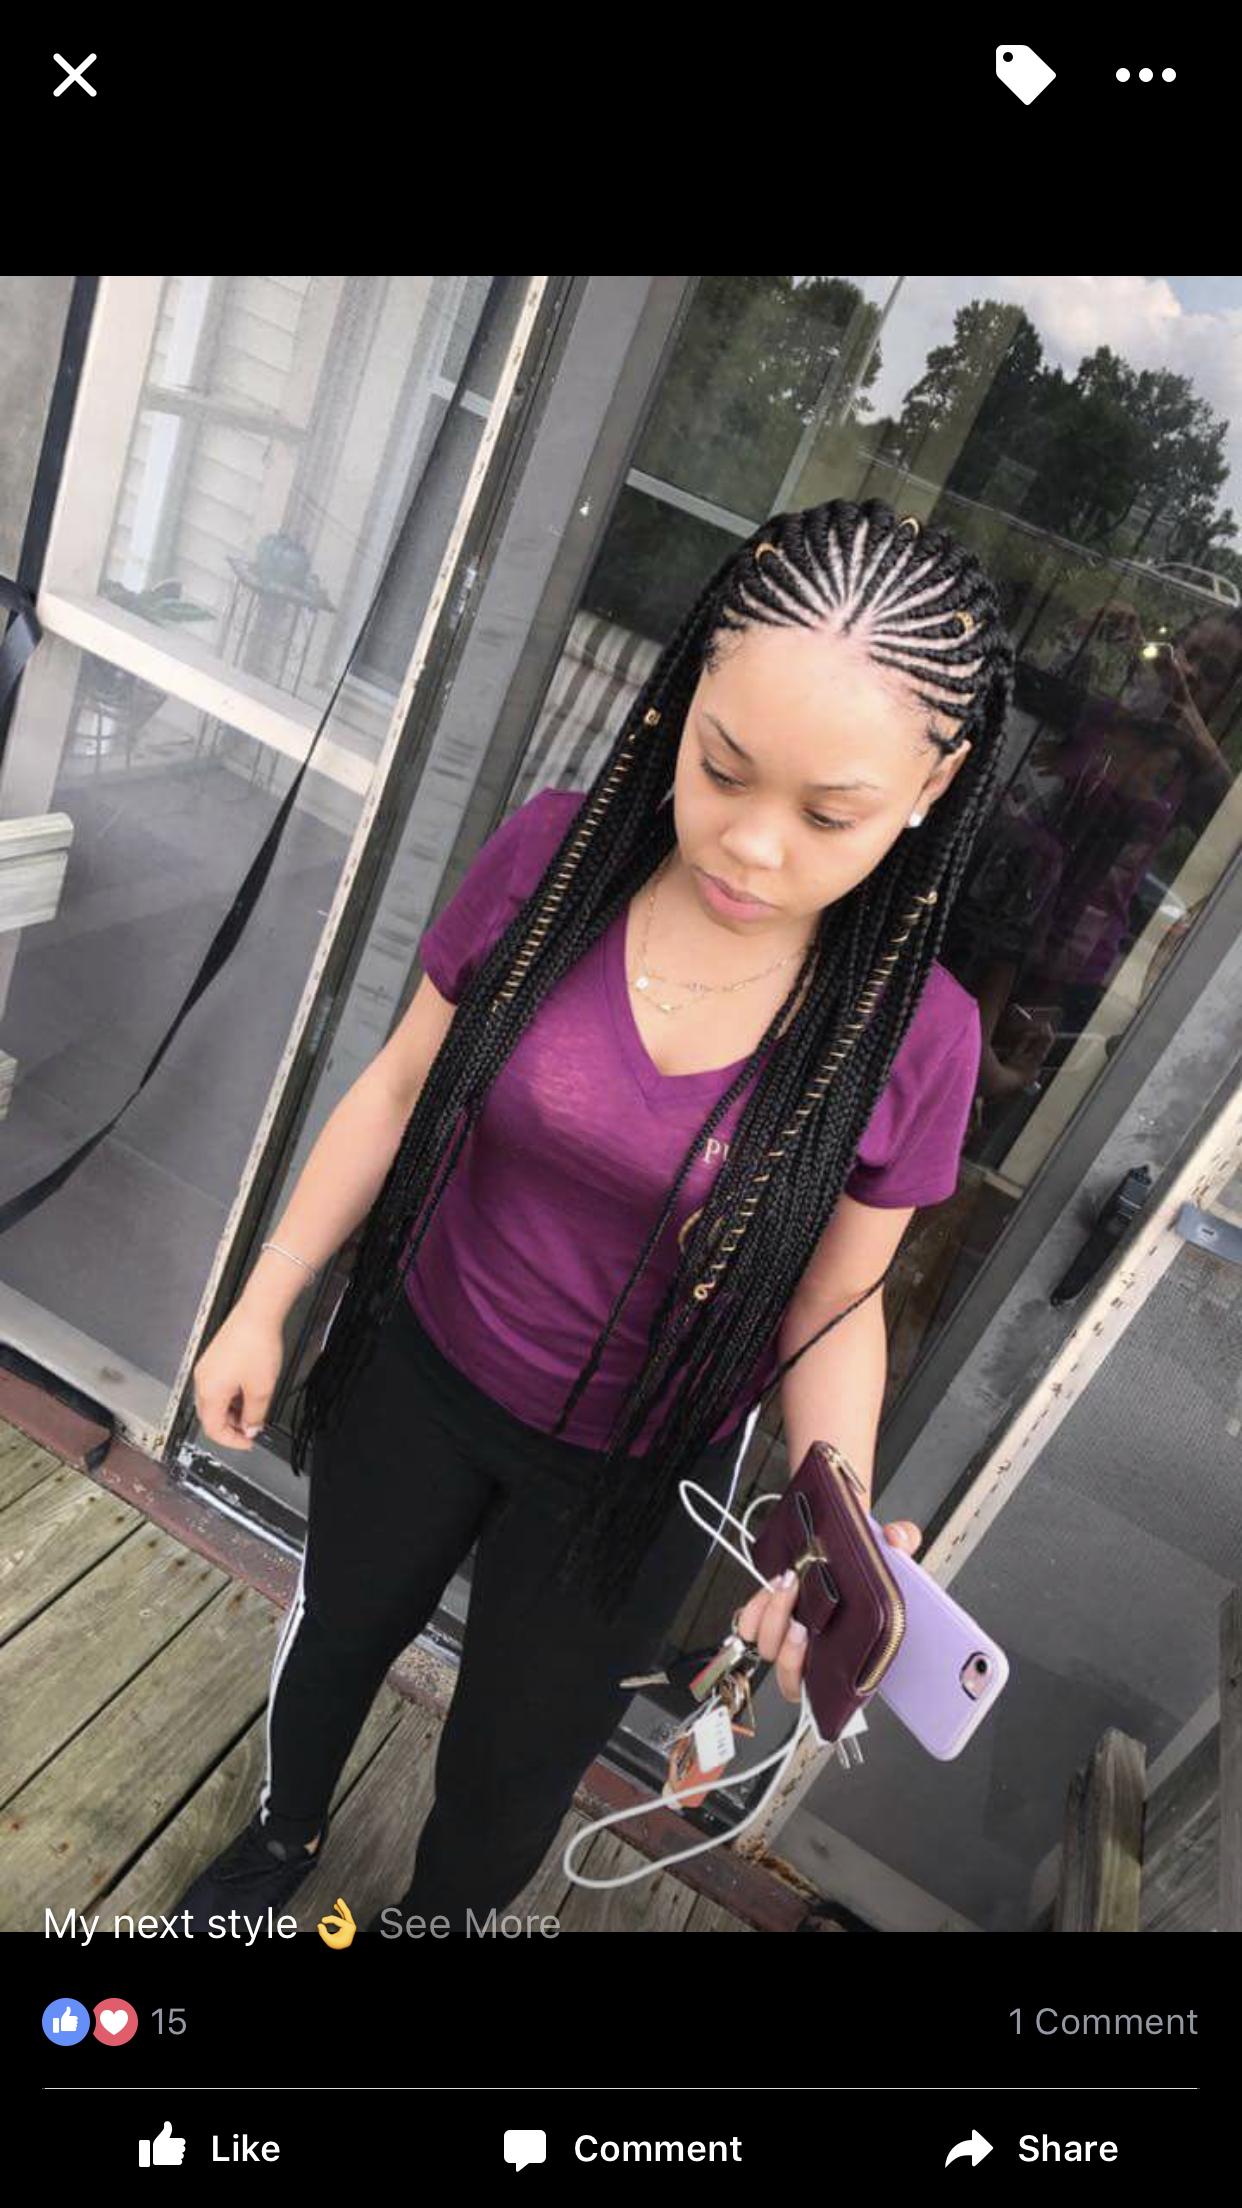 Pin by erica obebe on makeuphairnails pinterest black girls